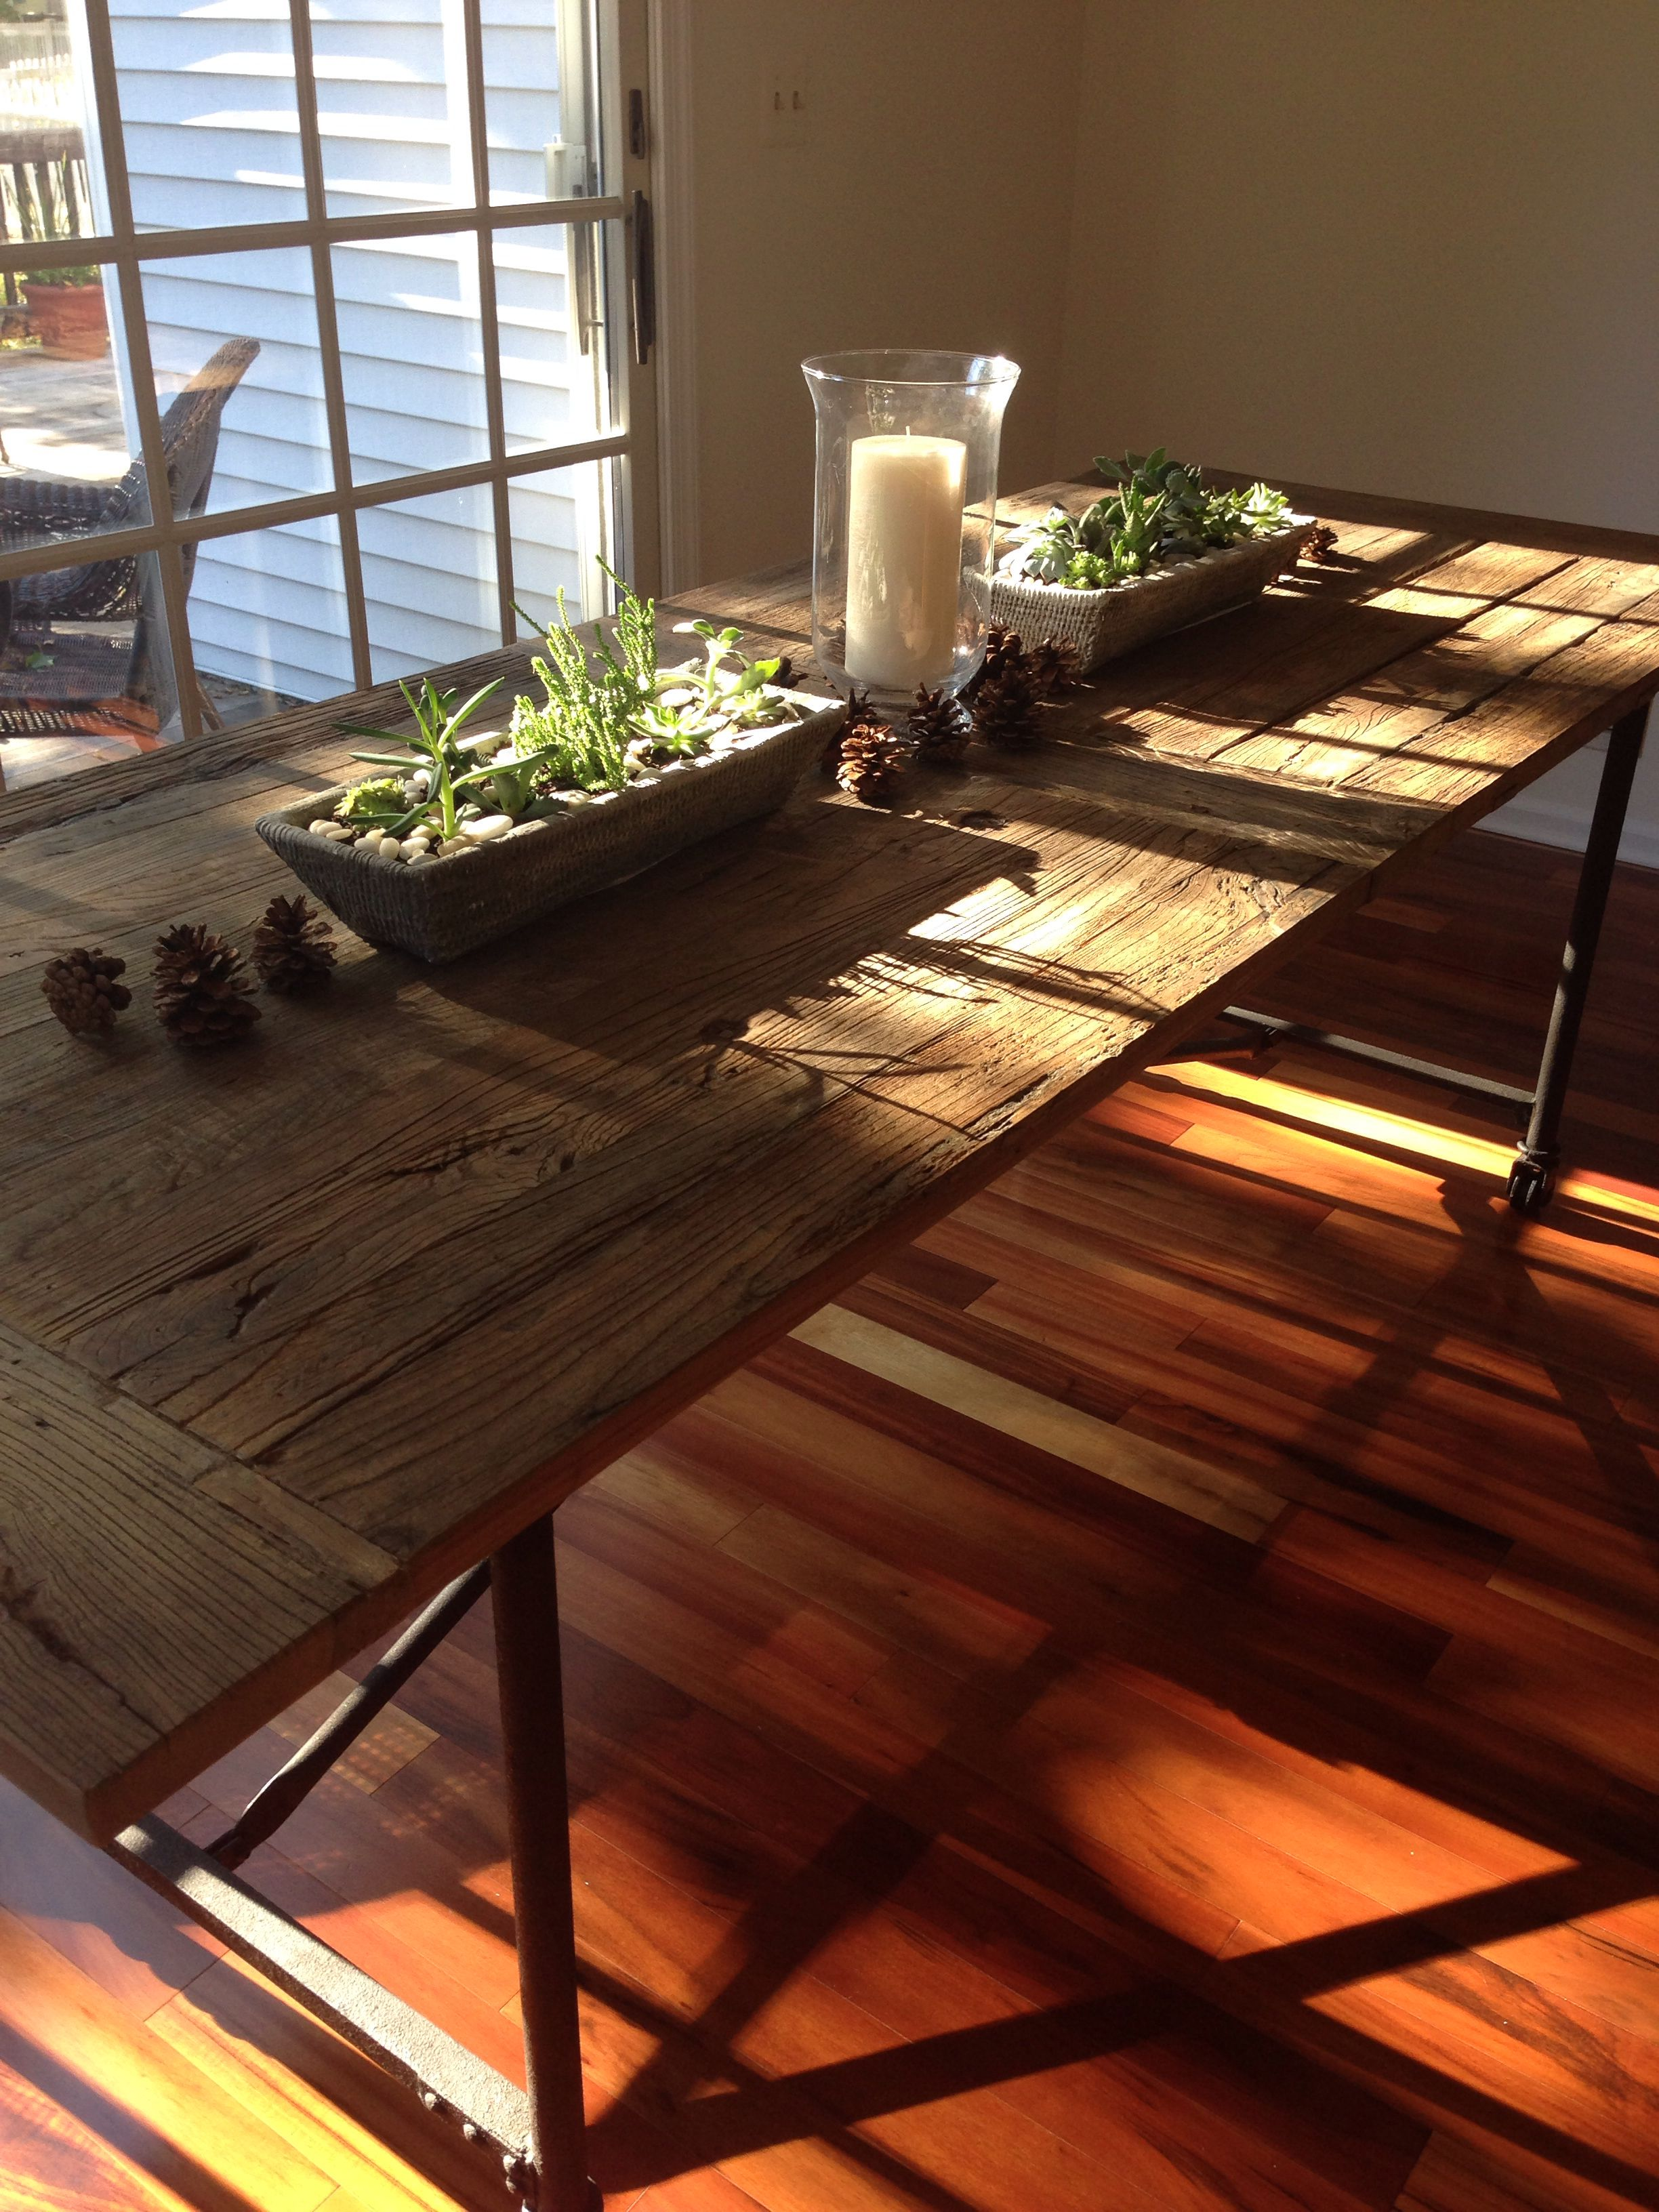 Restoration Hardware Flatiron Table Succulent Centerpieces